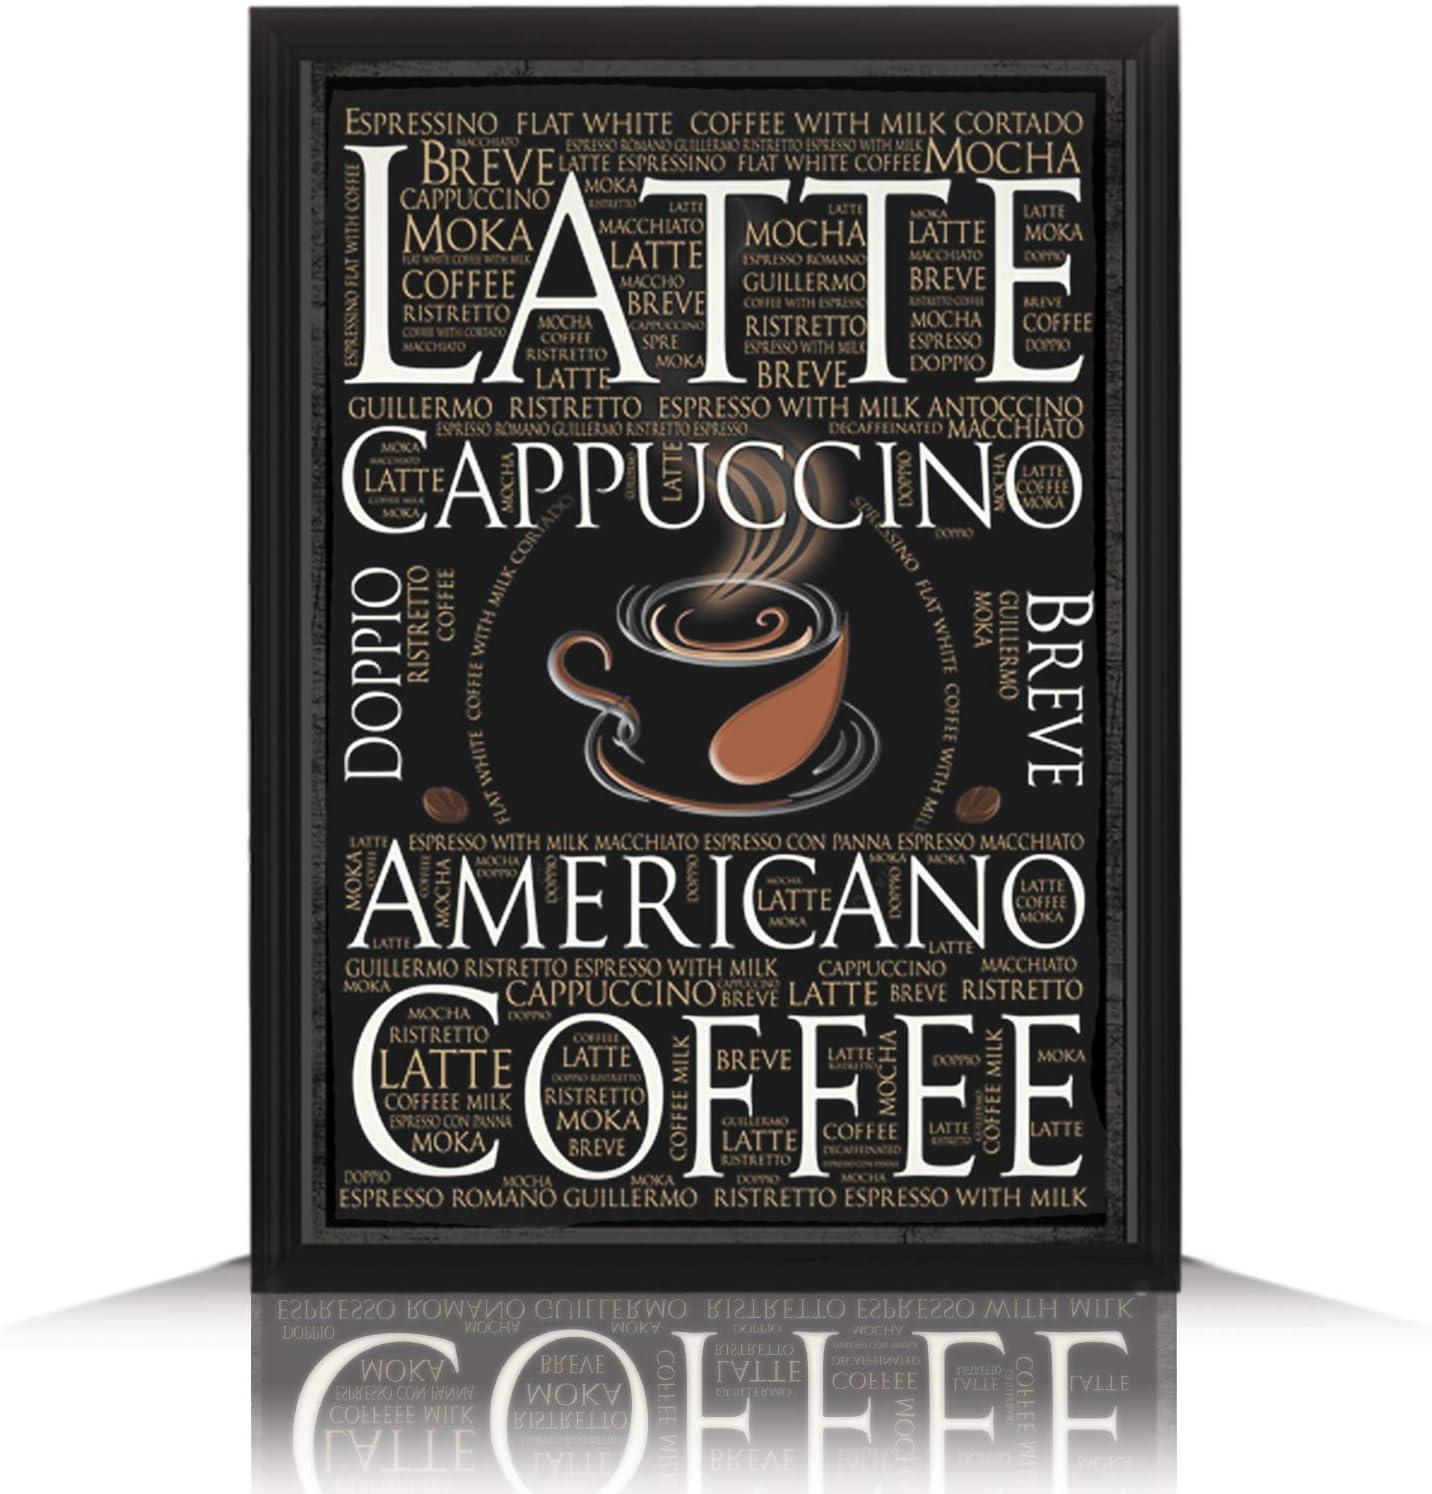 SKYPOP Premium Wooden Coffee Sign, Coffee Bar Accessories, Coffee bar Decor, Coffee Station, Coffee Decorations for Kitchen, Coffee Signs for Coffee Bar, Kitchen Decor (11x14 Inches)